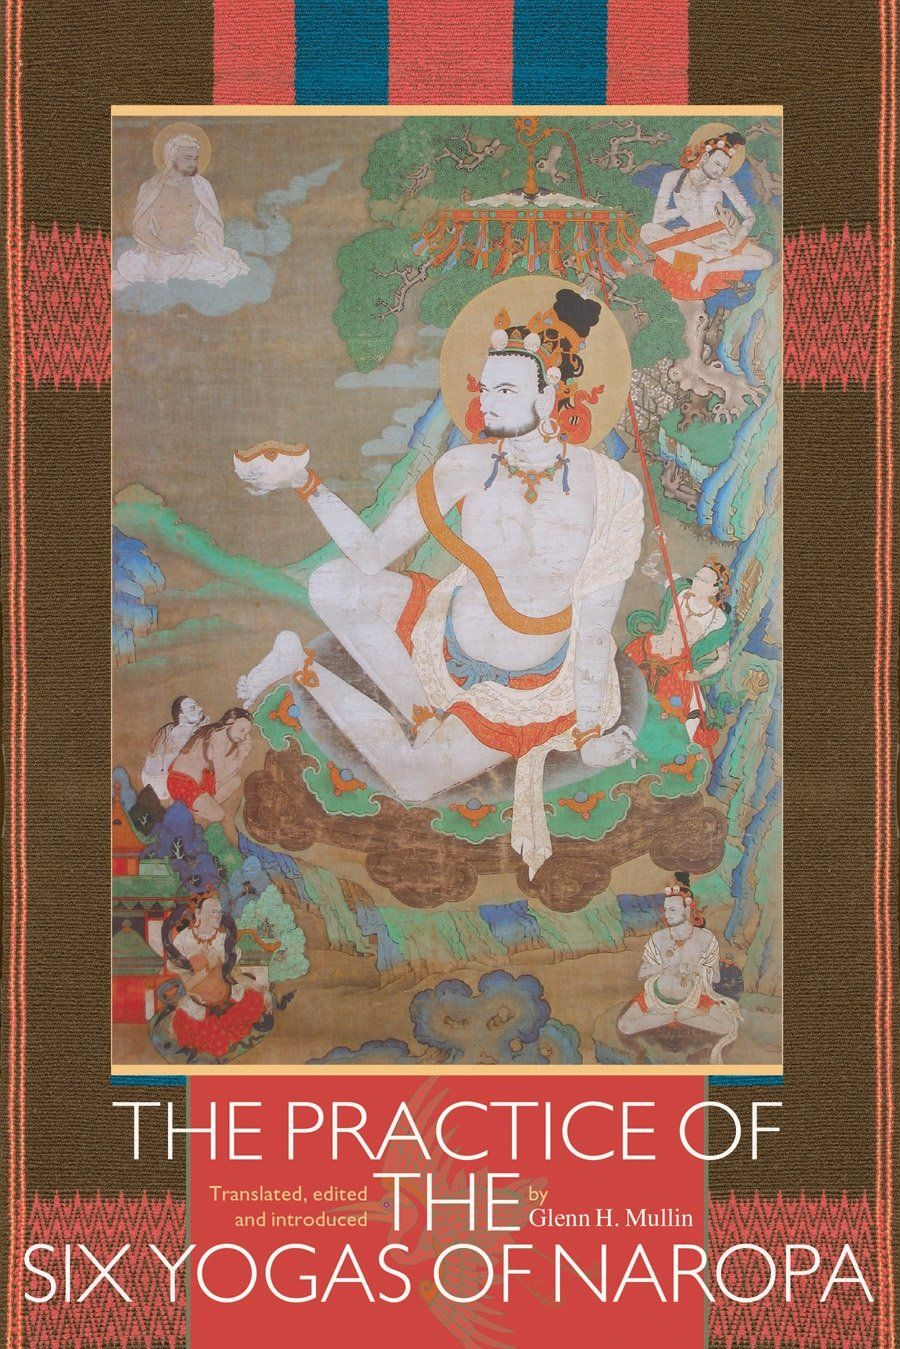 Mahasiddha Naropa: The Indomitable Disciple | Buddhist art